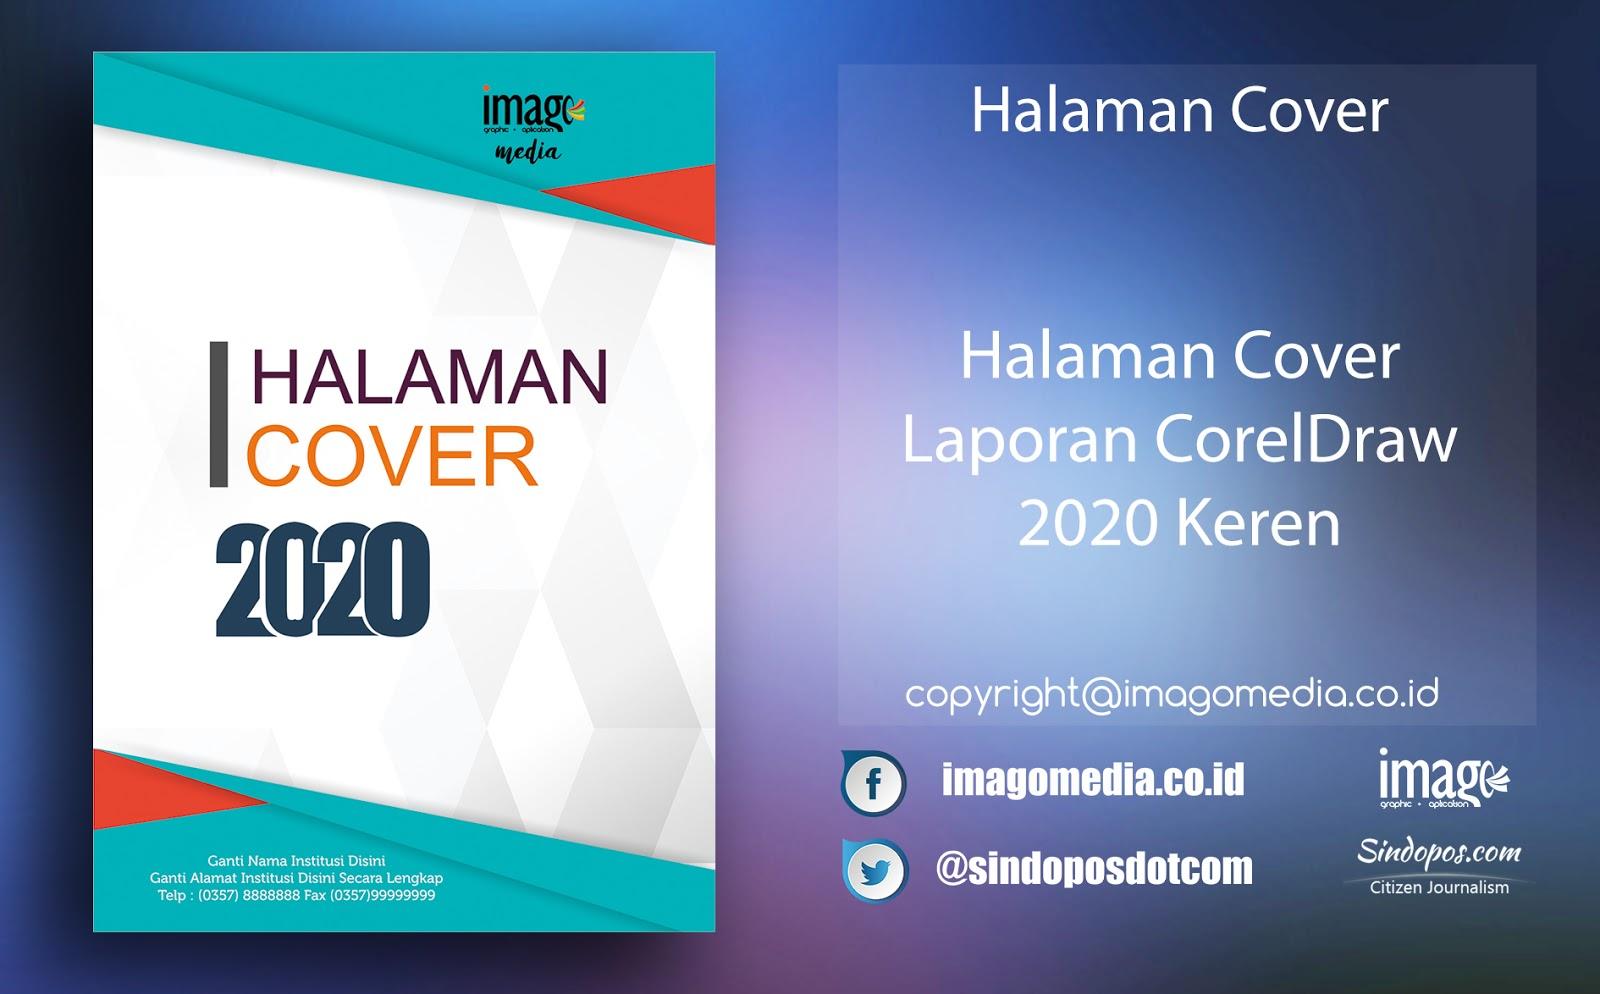 Halaman Cover Laporan Kegiatan Coreldraw 2020 Keren Imago Media Home Of Creativity